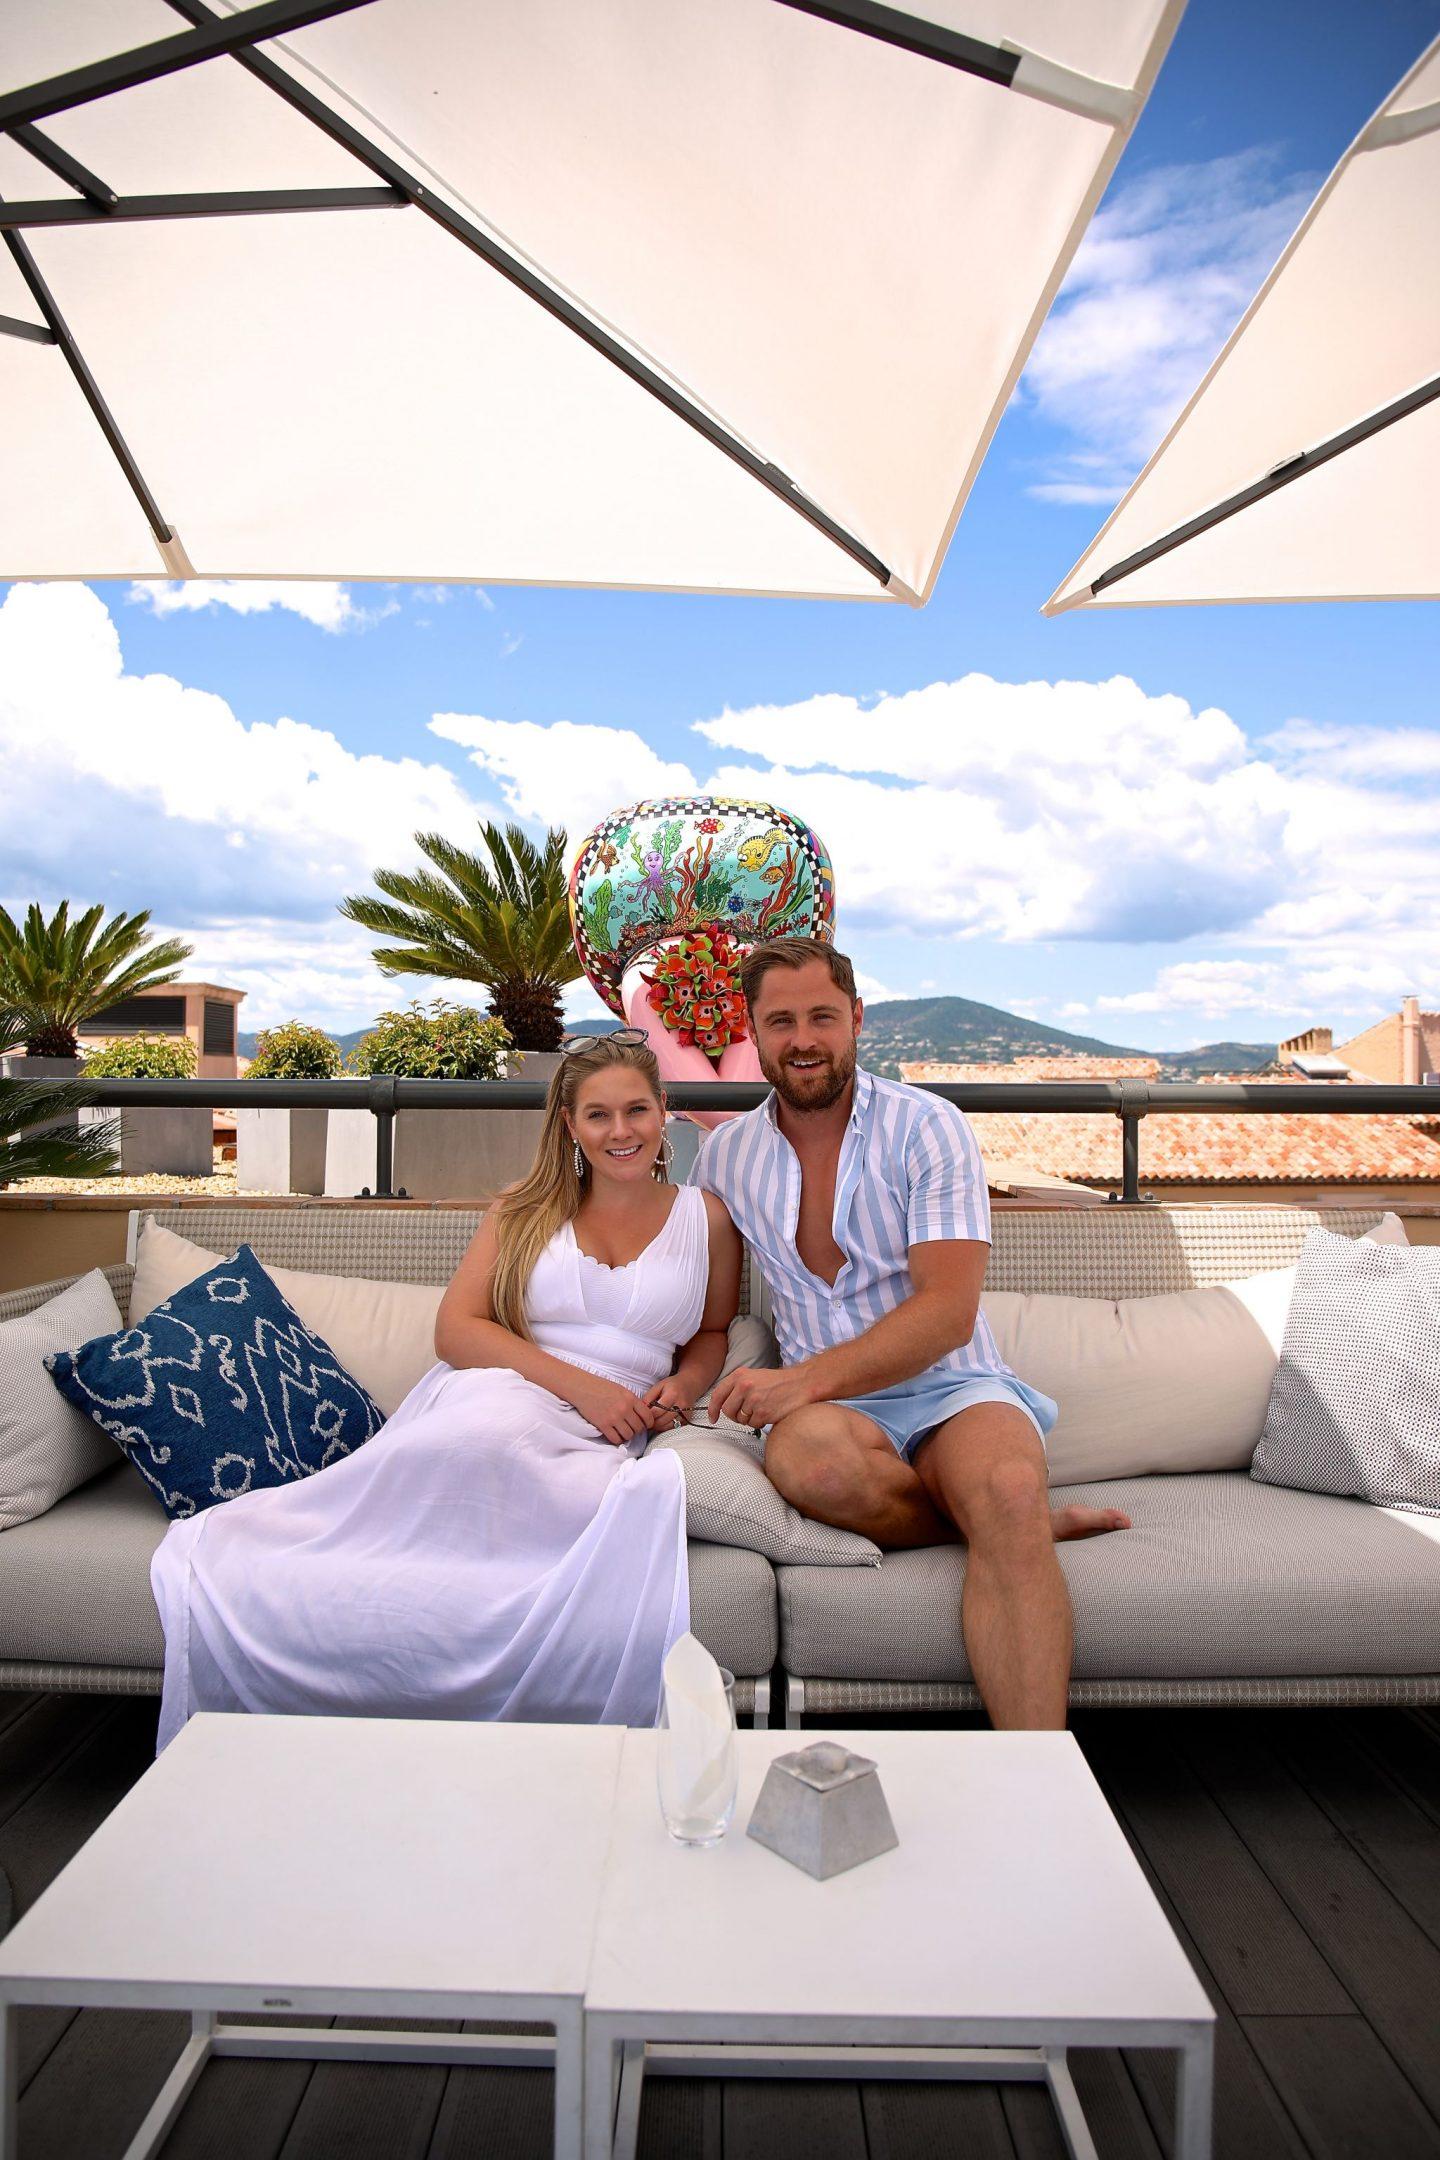 Hotel de Paris, St Tropez – A Preferred Hotel